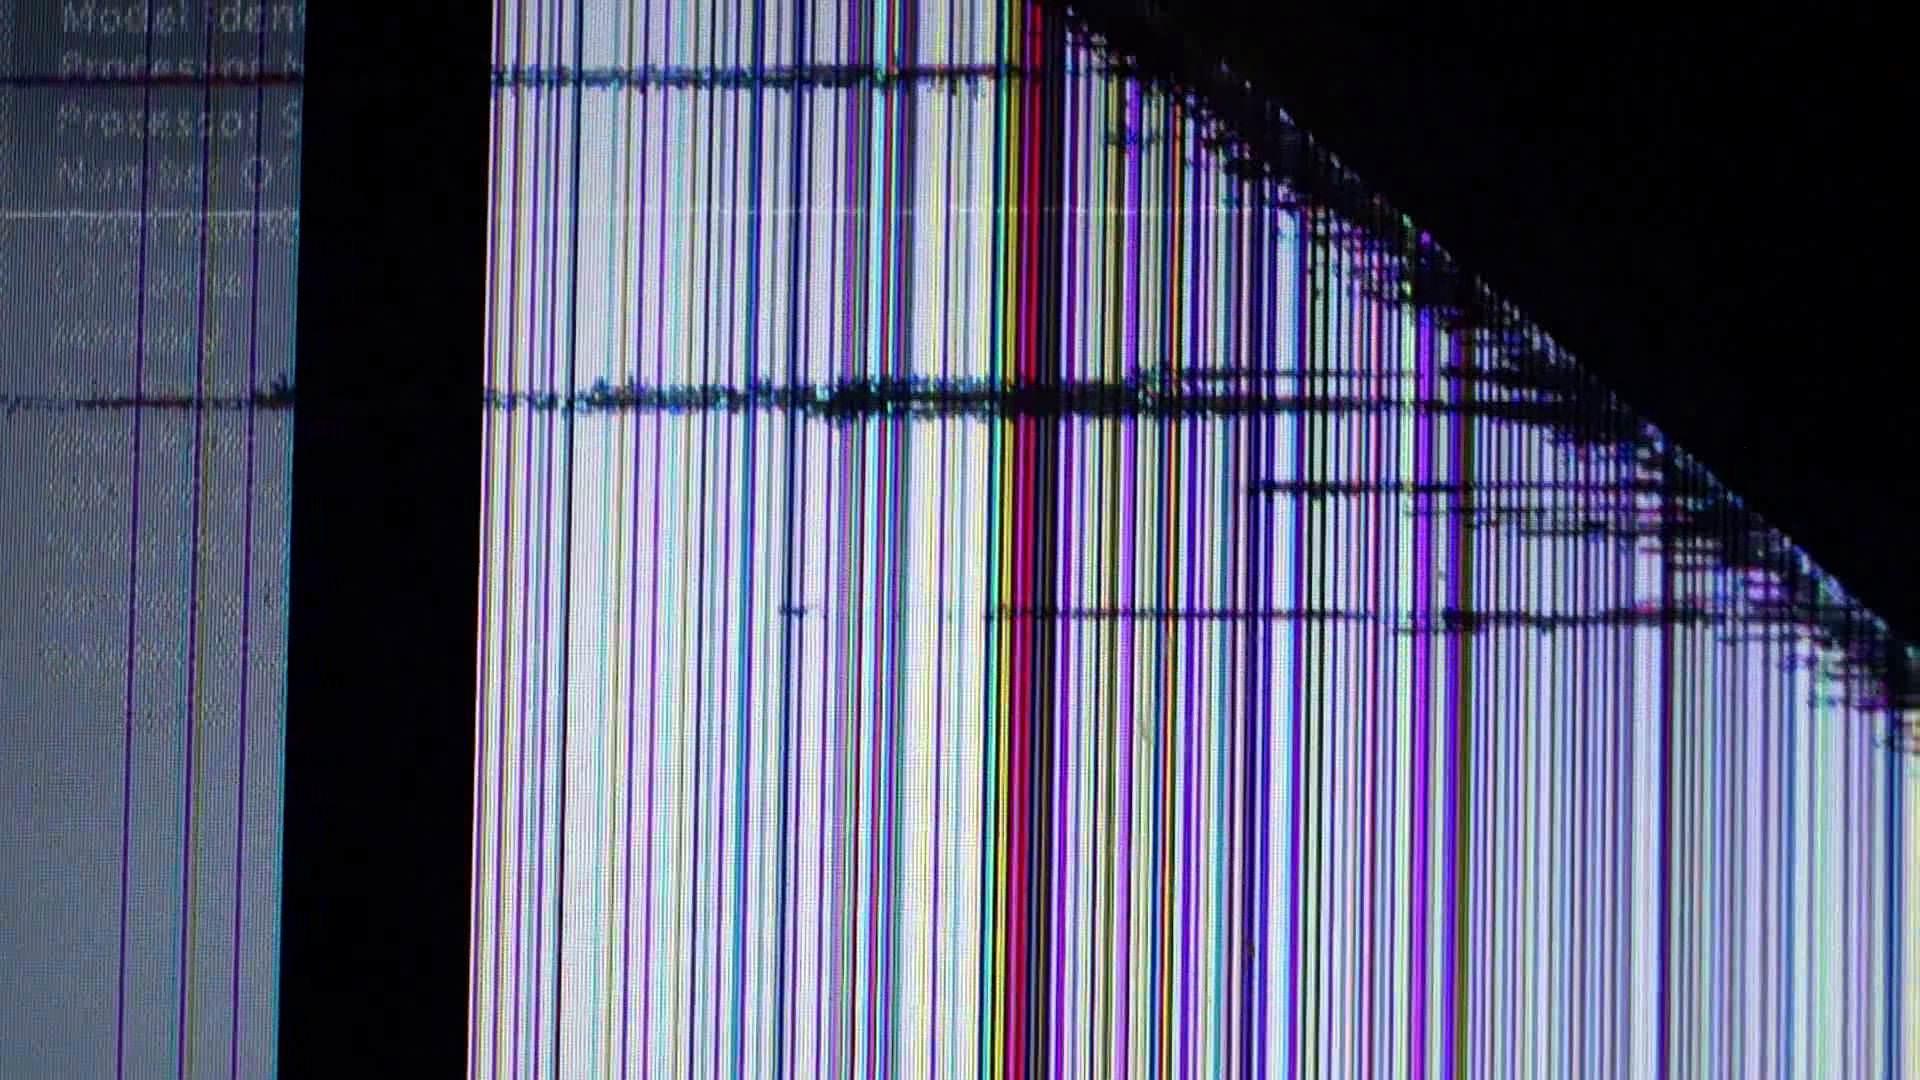 6 Broken Screen Wallpapers Prank For Windows And Mac Laptops